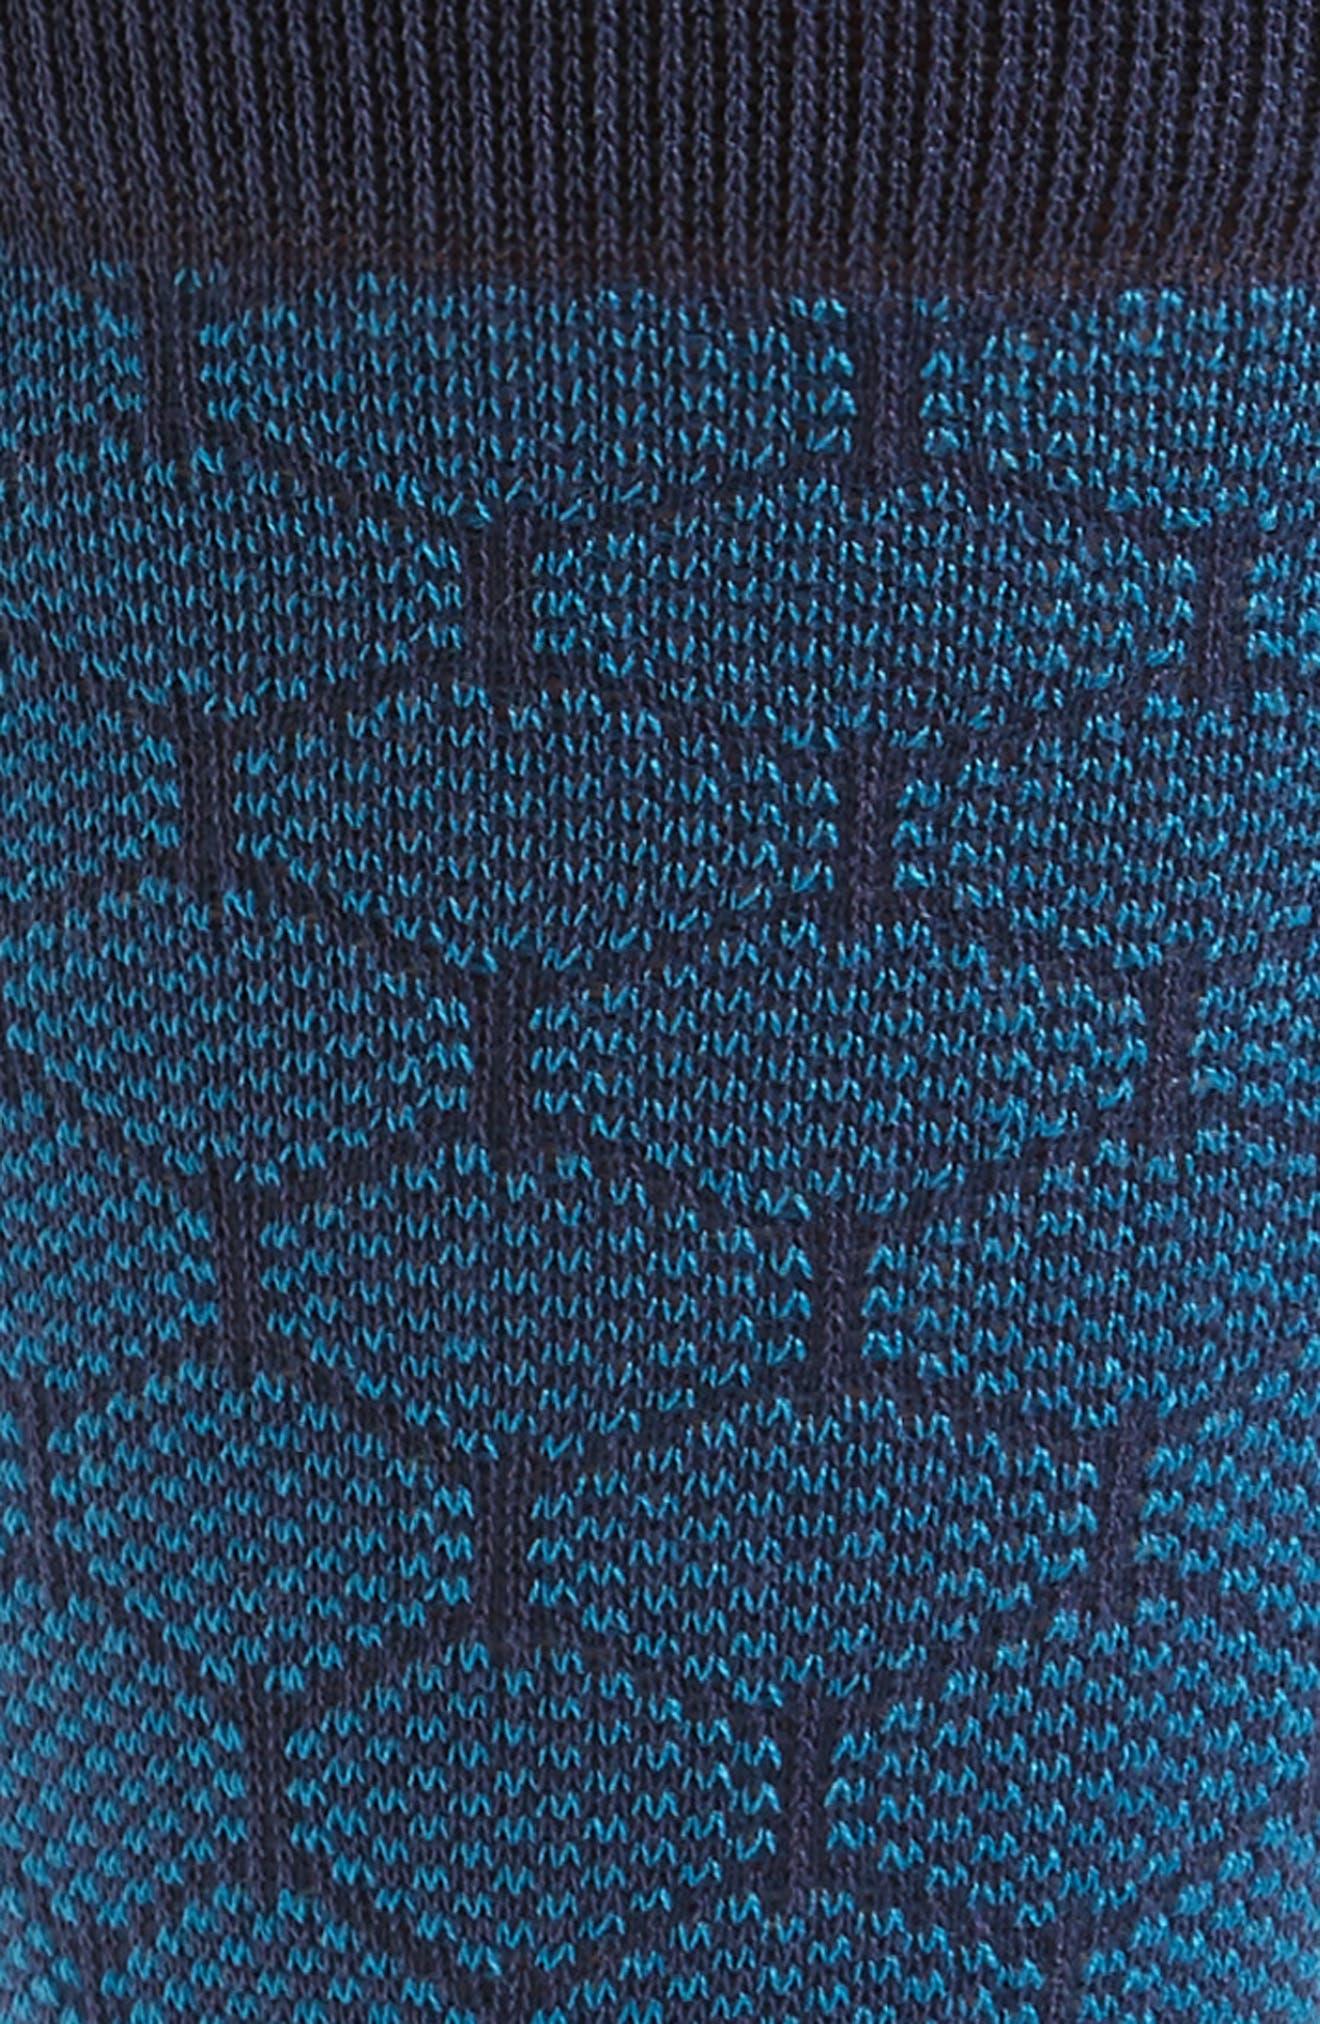 Mercerized Honeycomb Socks,                             Alternate thumbnail 2, color,                             Blue/ Navy